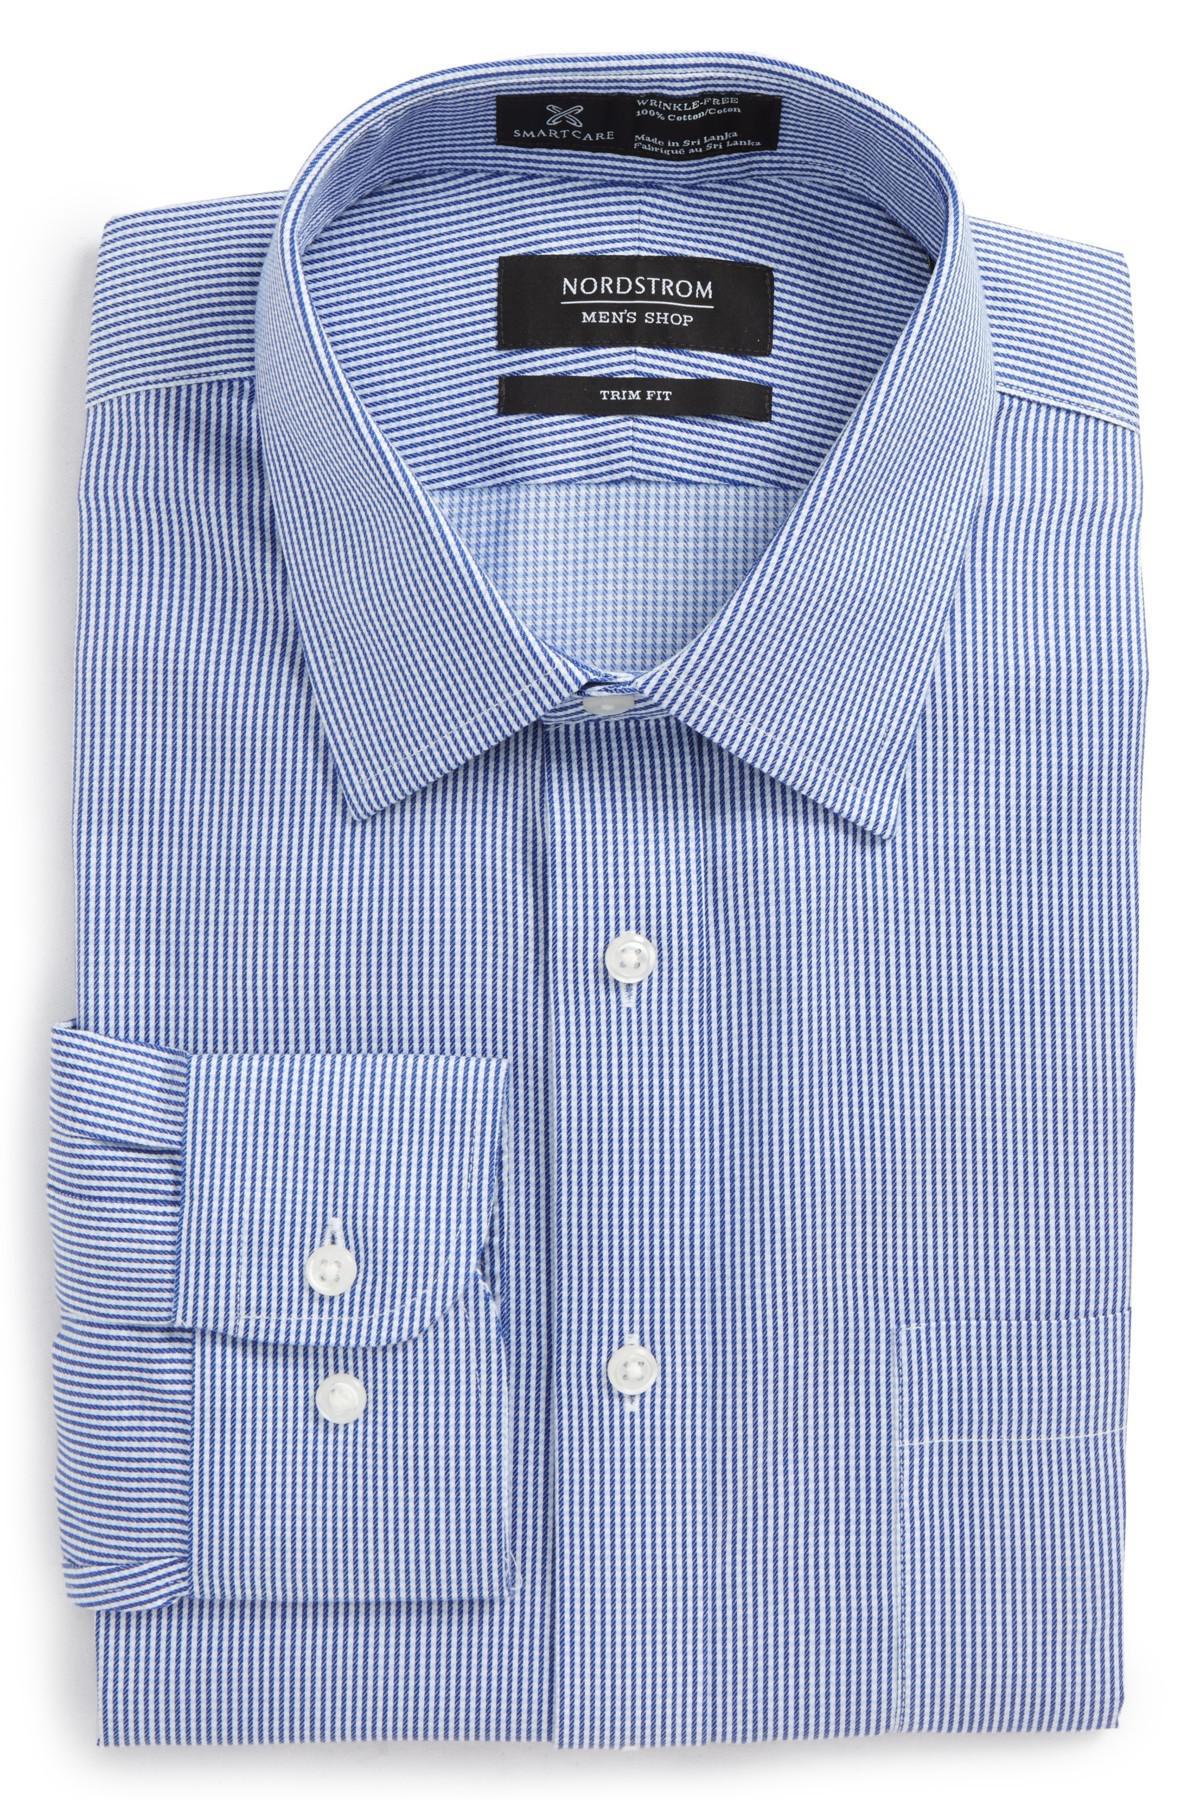 b7588fa8845e nordstrom-designer-NAVY-PRINT-Smartcaretm-Trim-Fit-Stripe-Dress-Shirt.jpeg